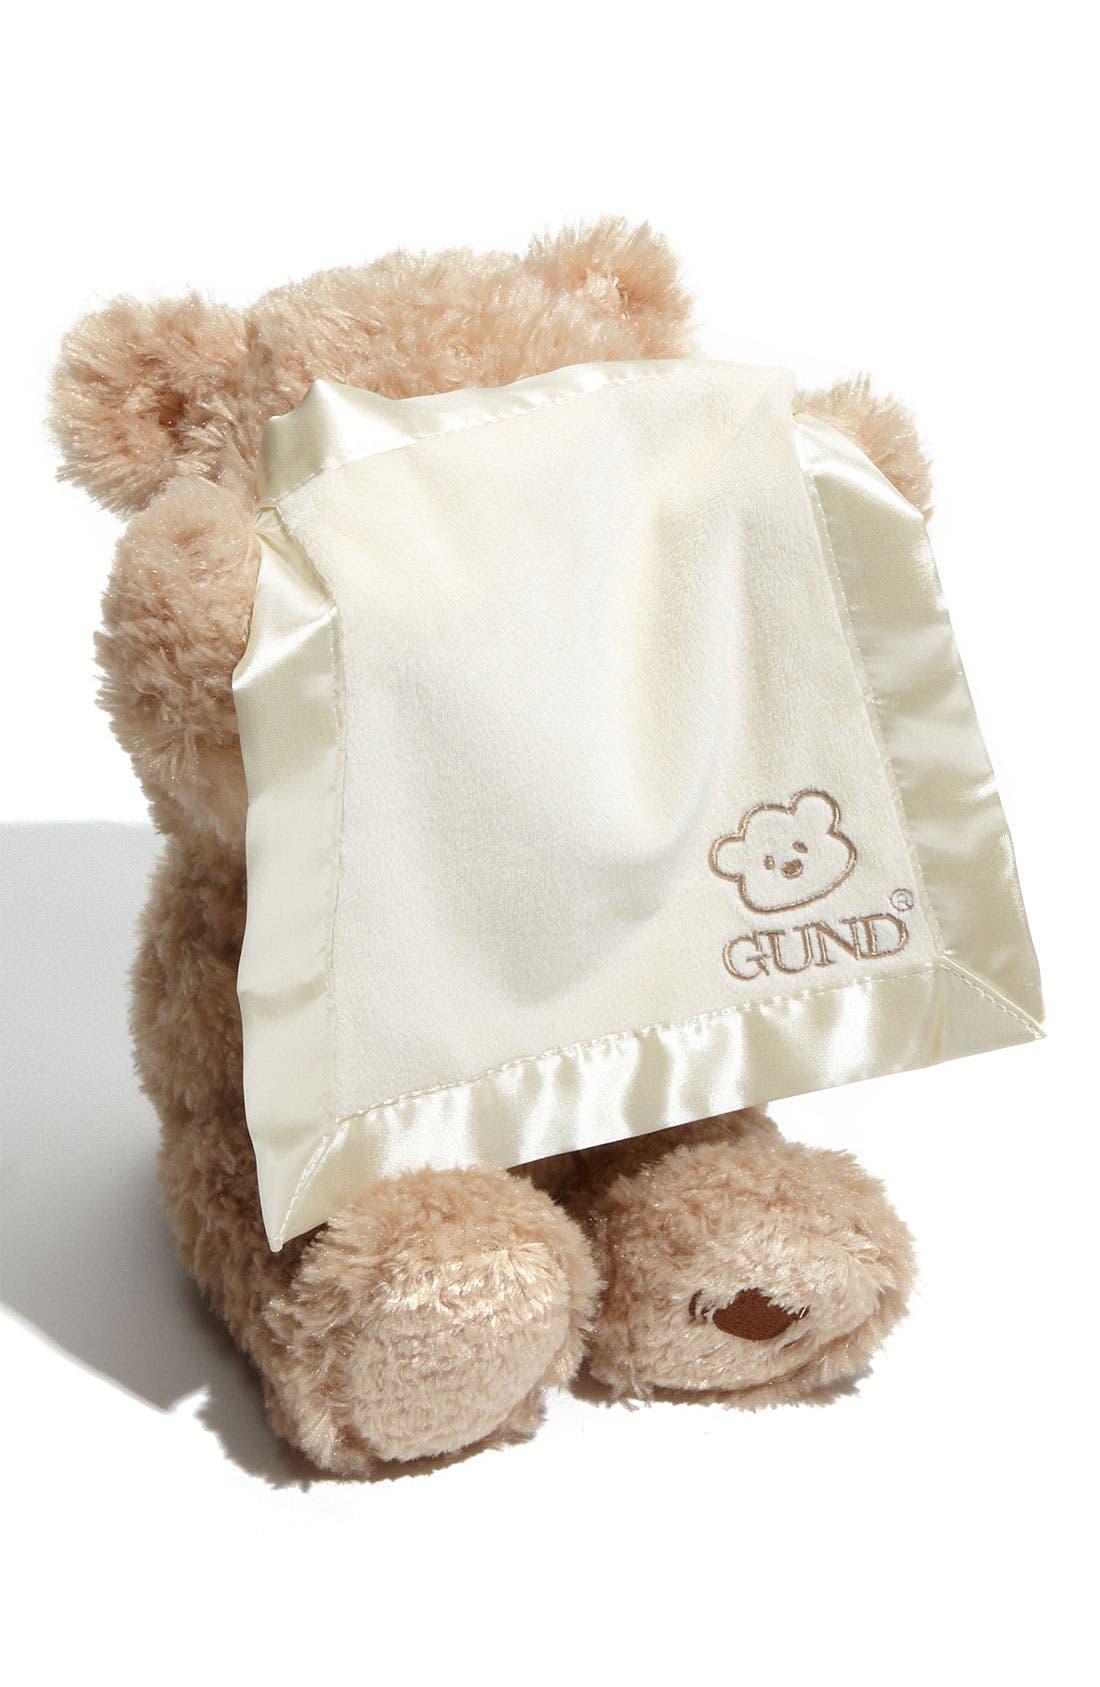 Baby Gund 'Peekaboo' Bear,                             Alternate thumbnail 4, color,                             NO COLOR